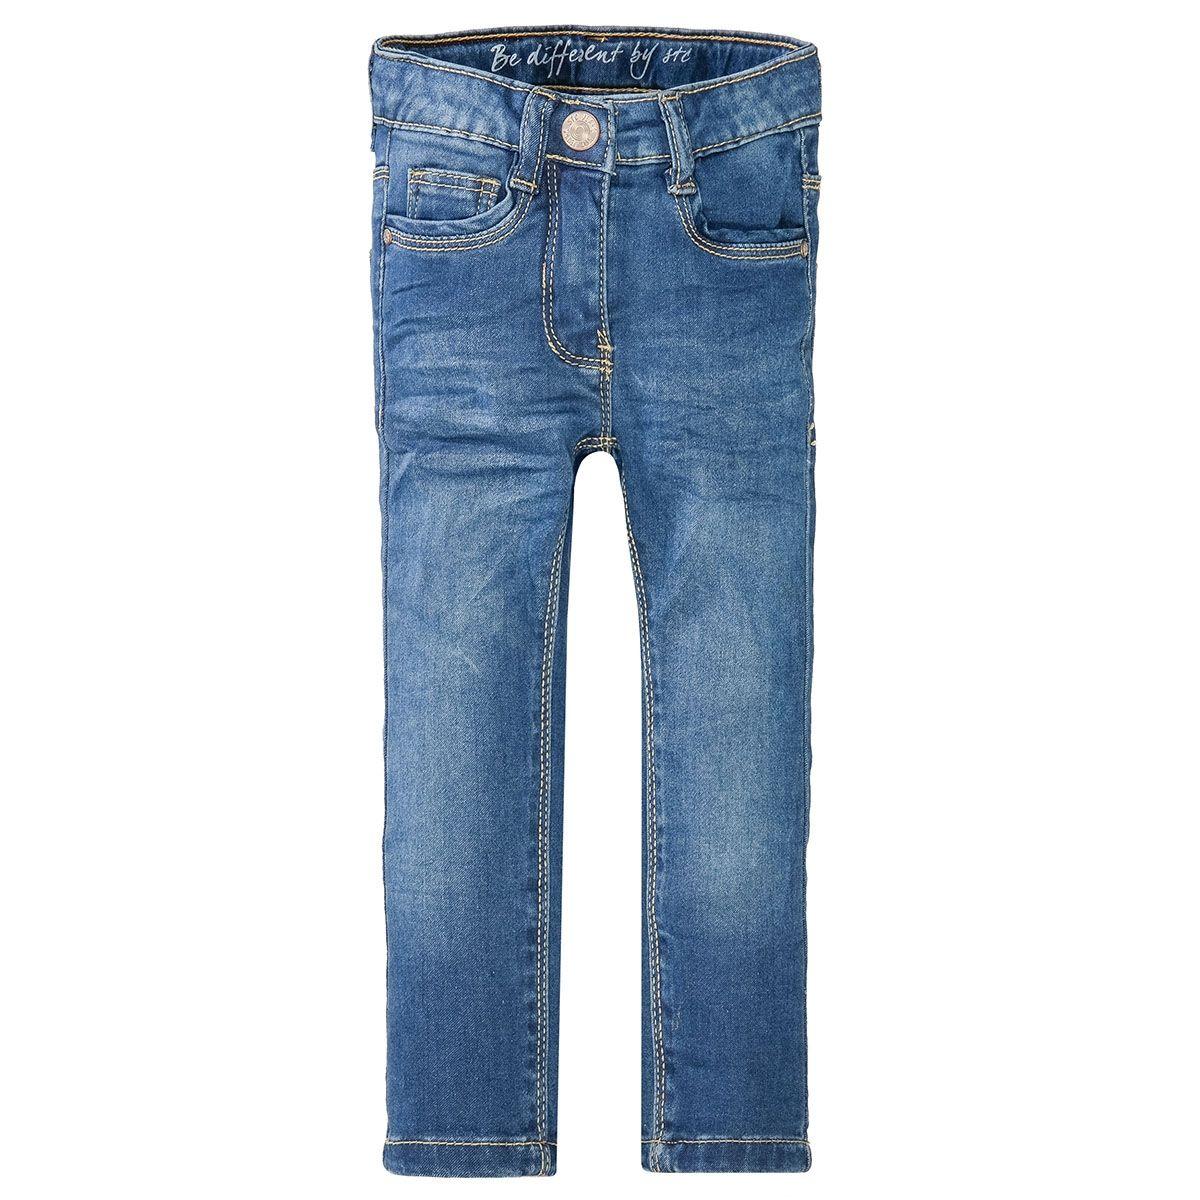 Mädchen Skinny Jeans Slim Fit - Mid Blue Denim